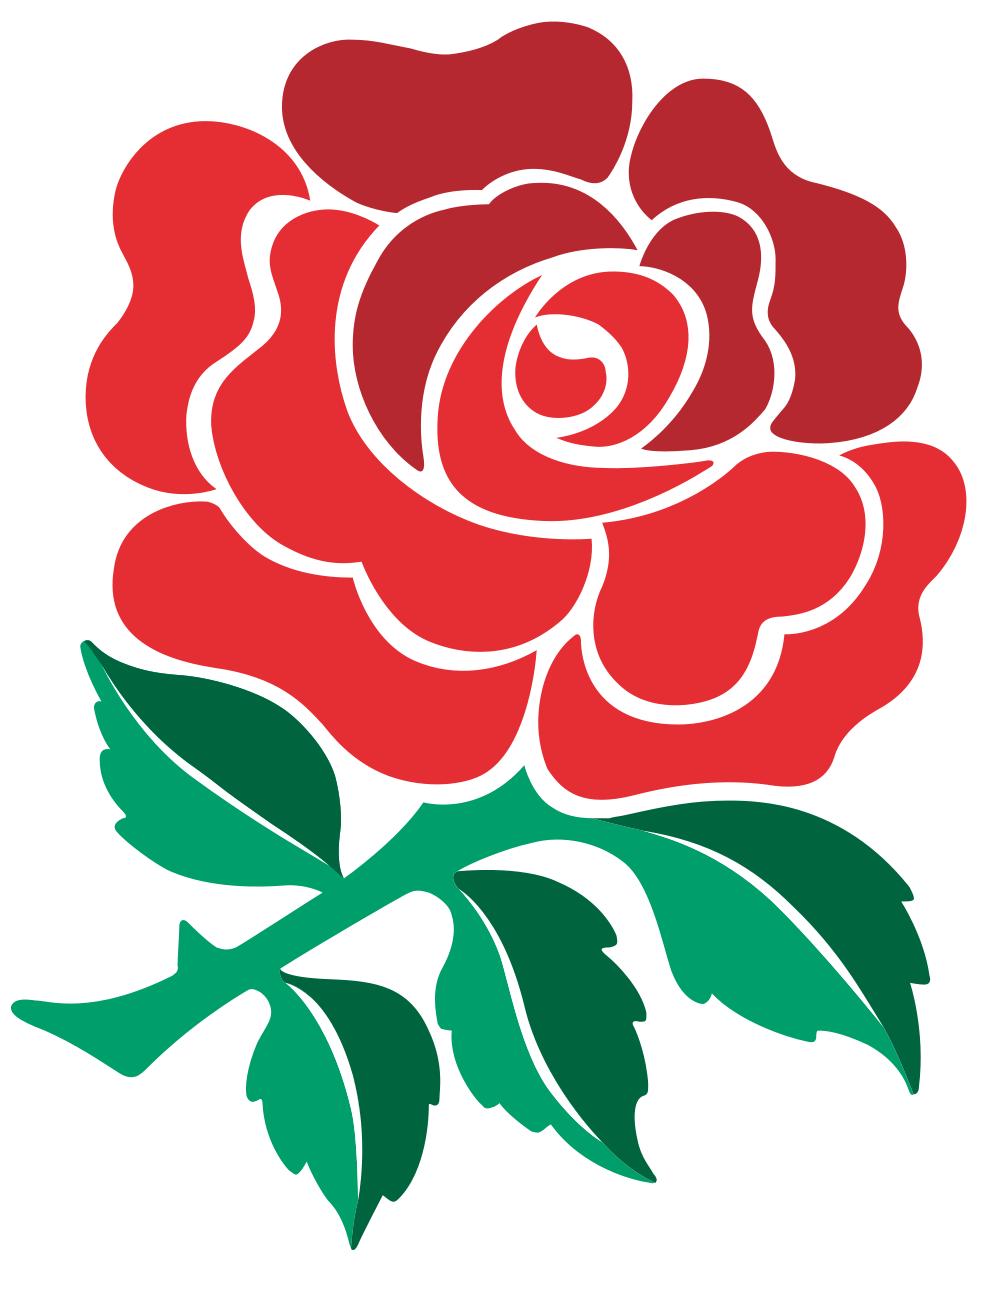 Home / Rugby / England Rugby Federration / England Rugby Logo Tattoo